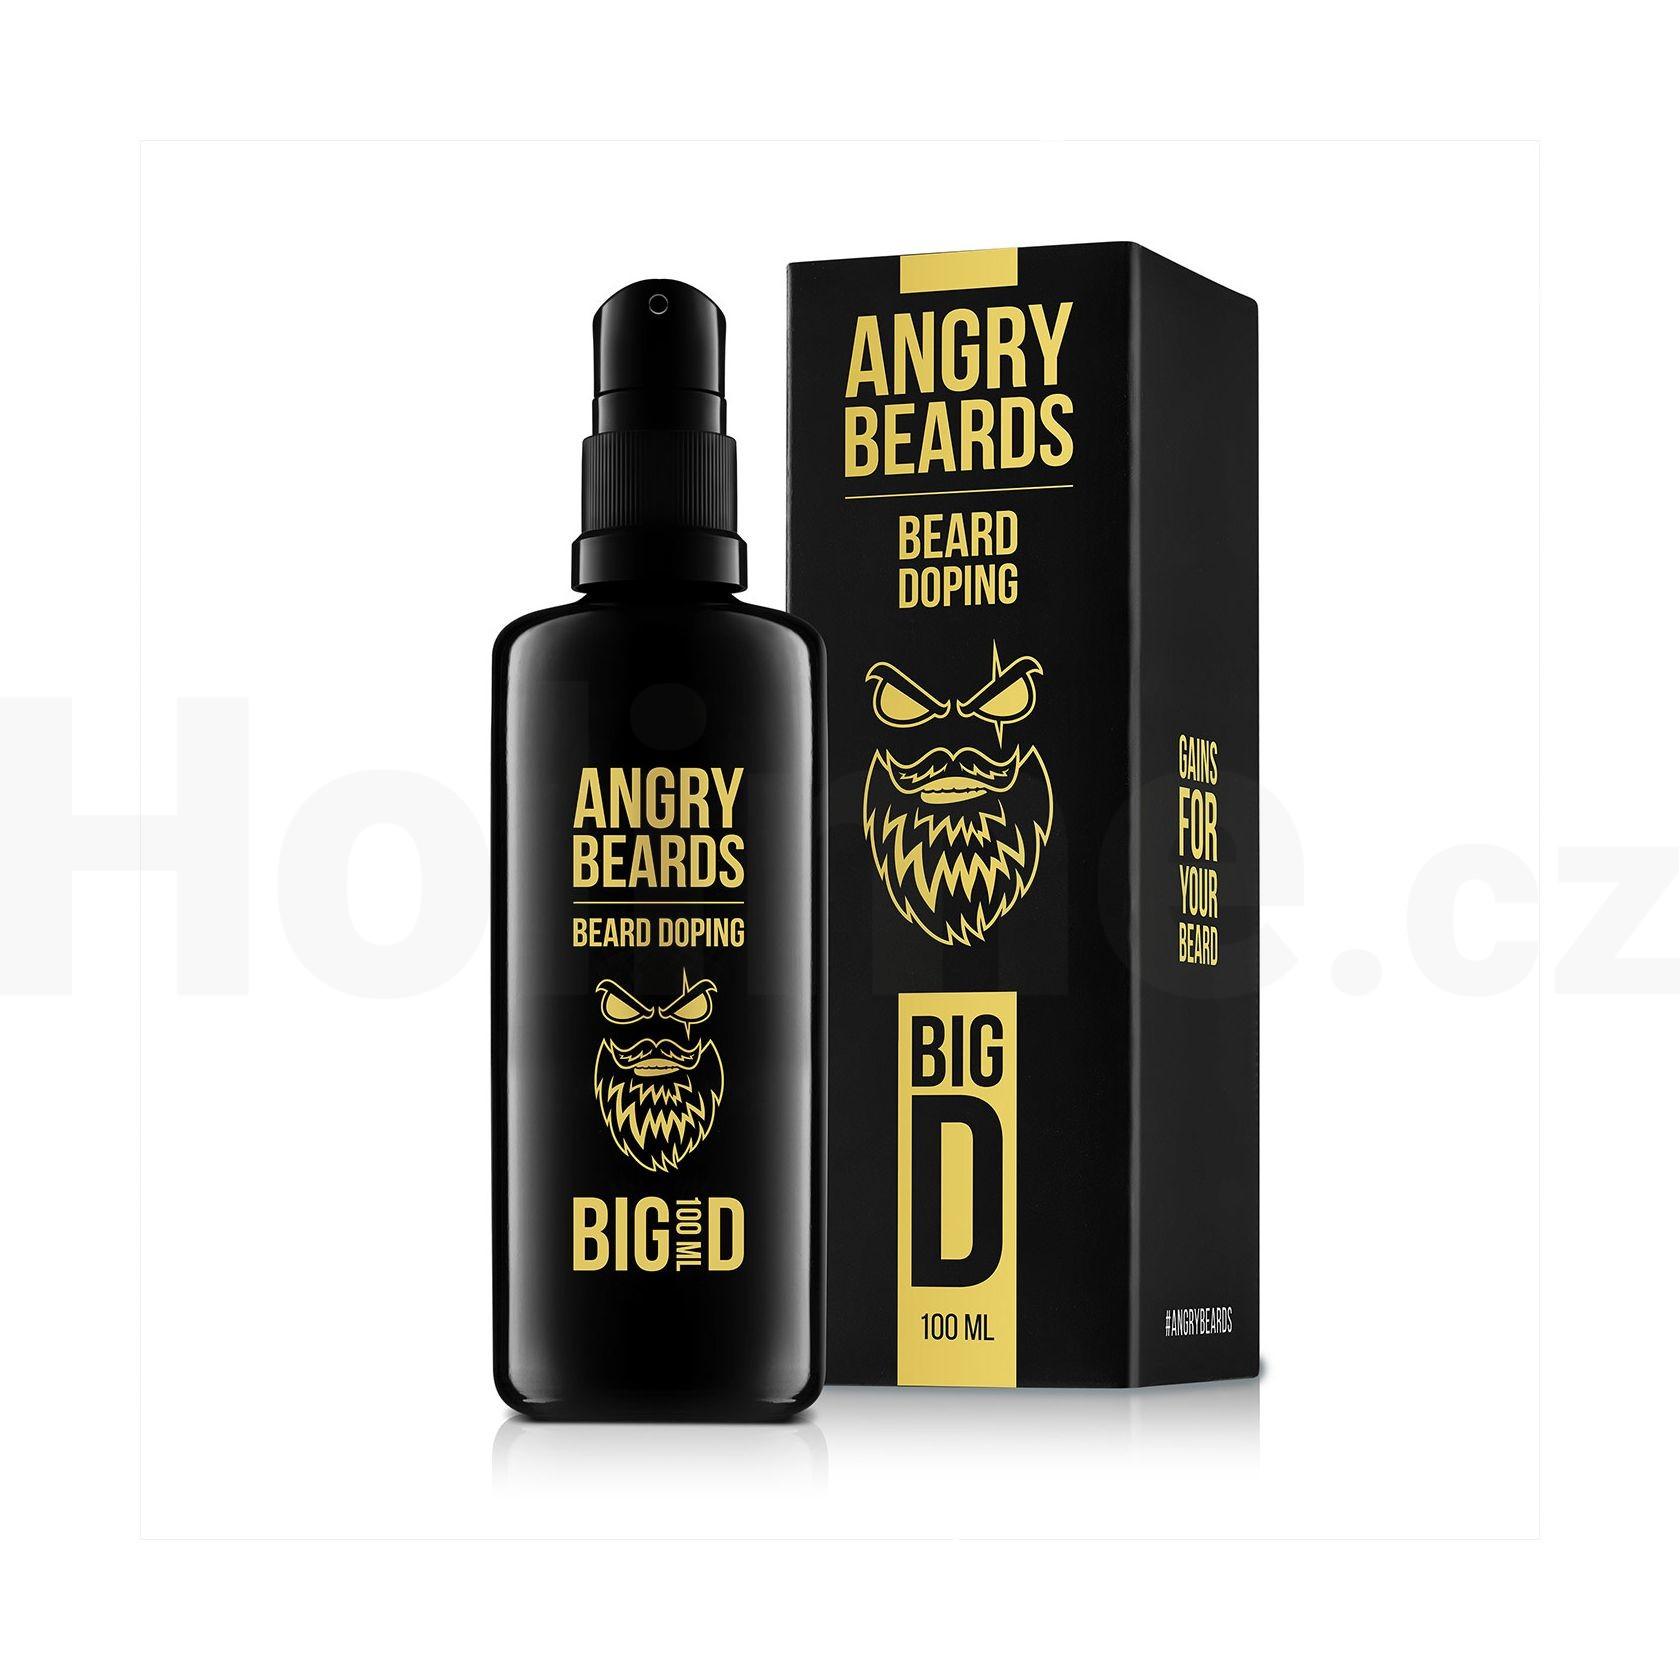 Angry Beards Beard Doping Big D sérum na vousy 100 ml